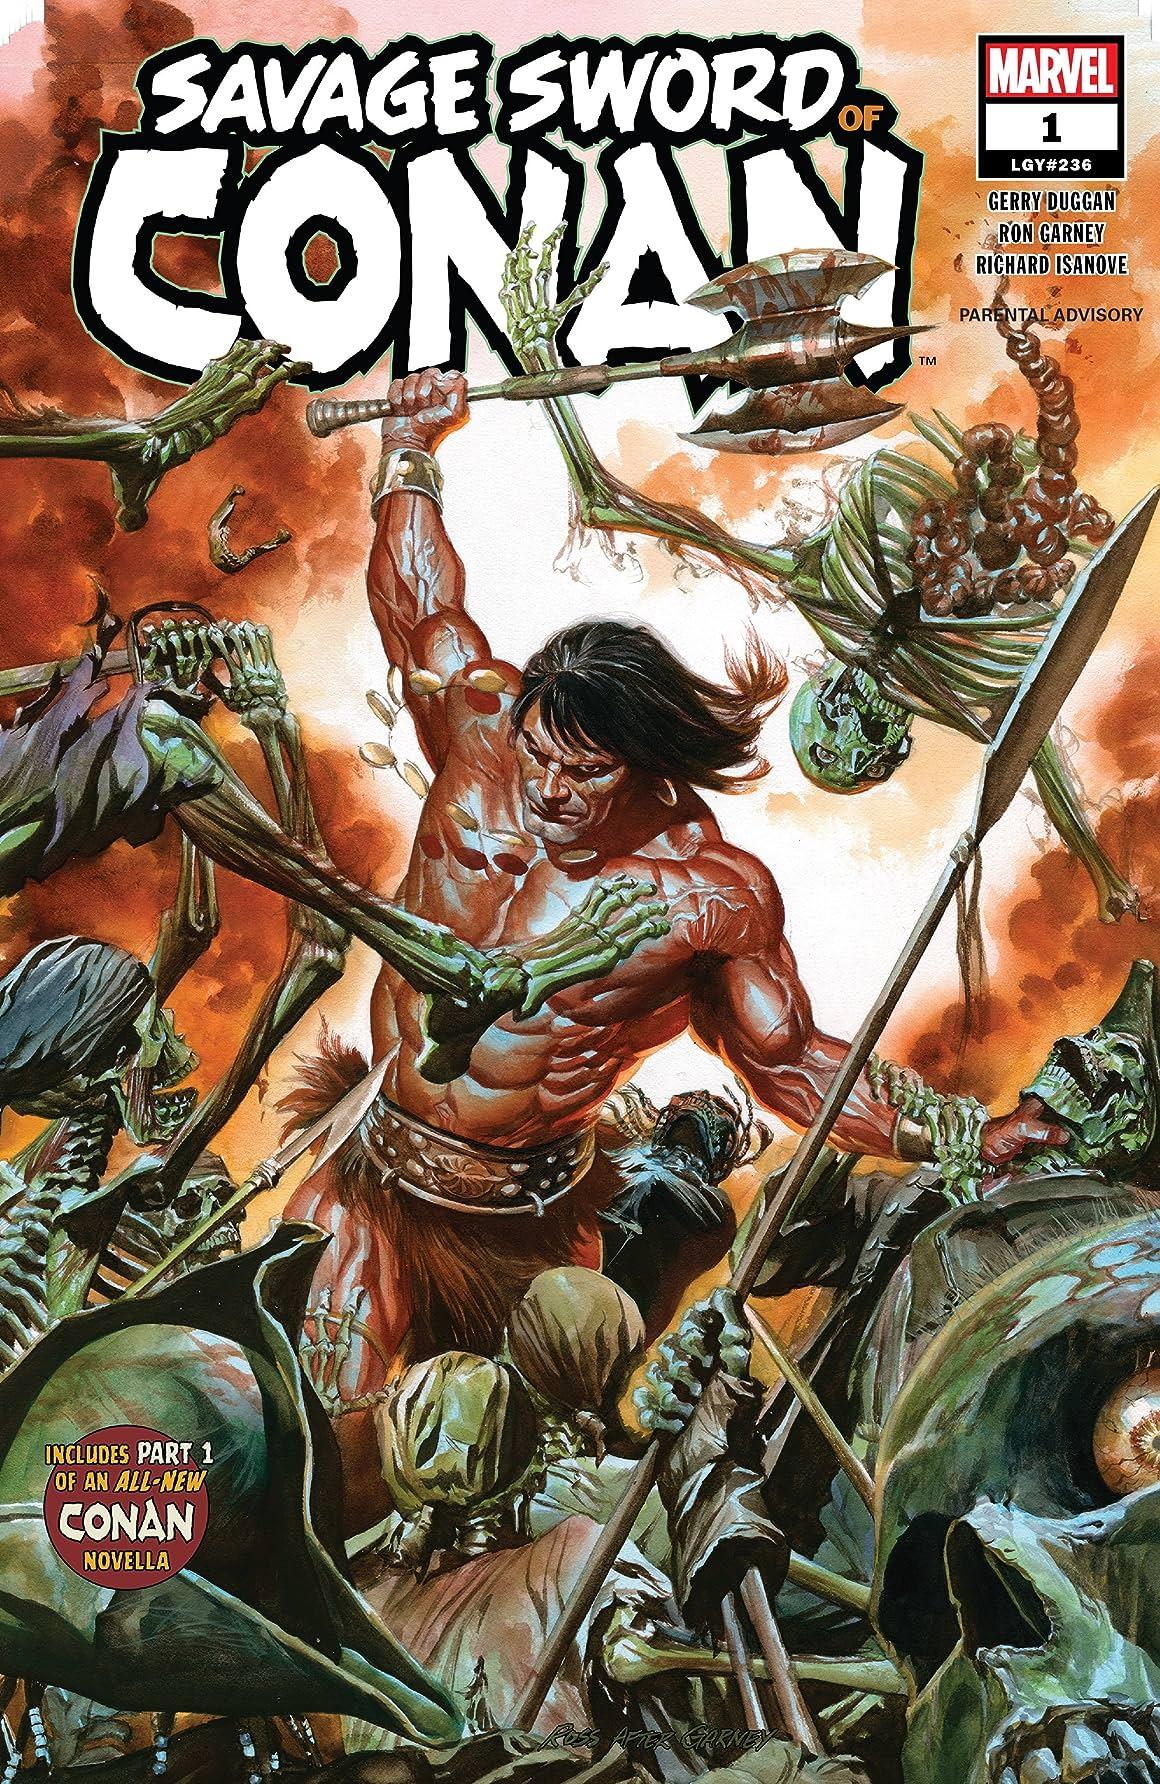 Copertina di Savage Sword of Conan n. 1. Disegni di Alex Ross.